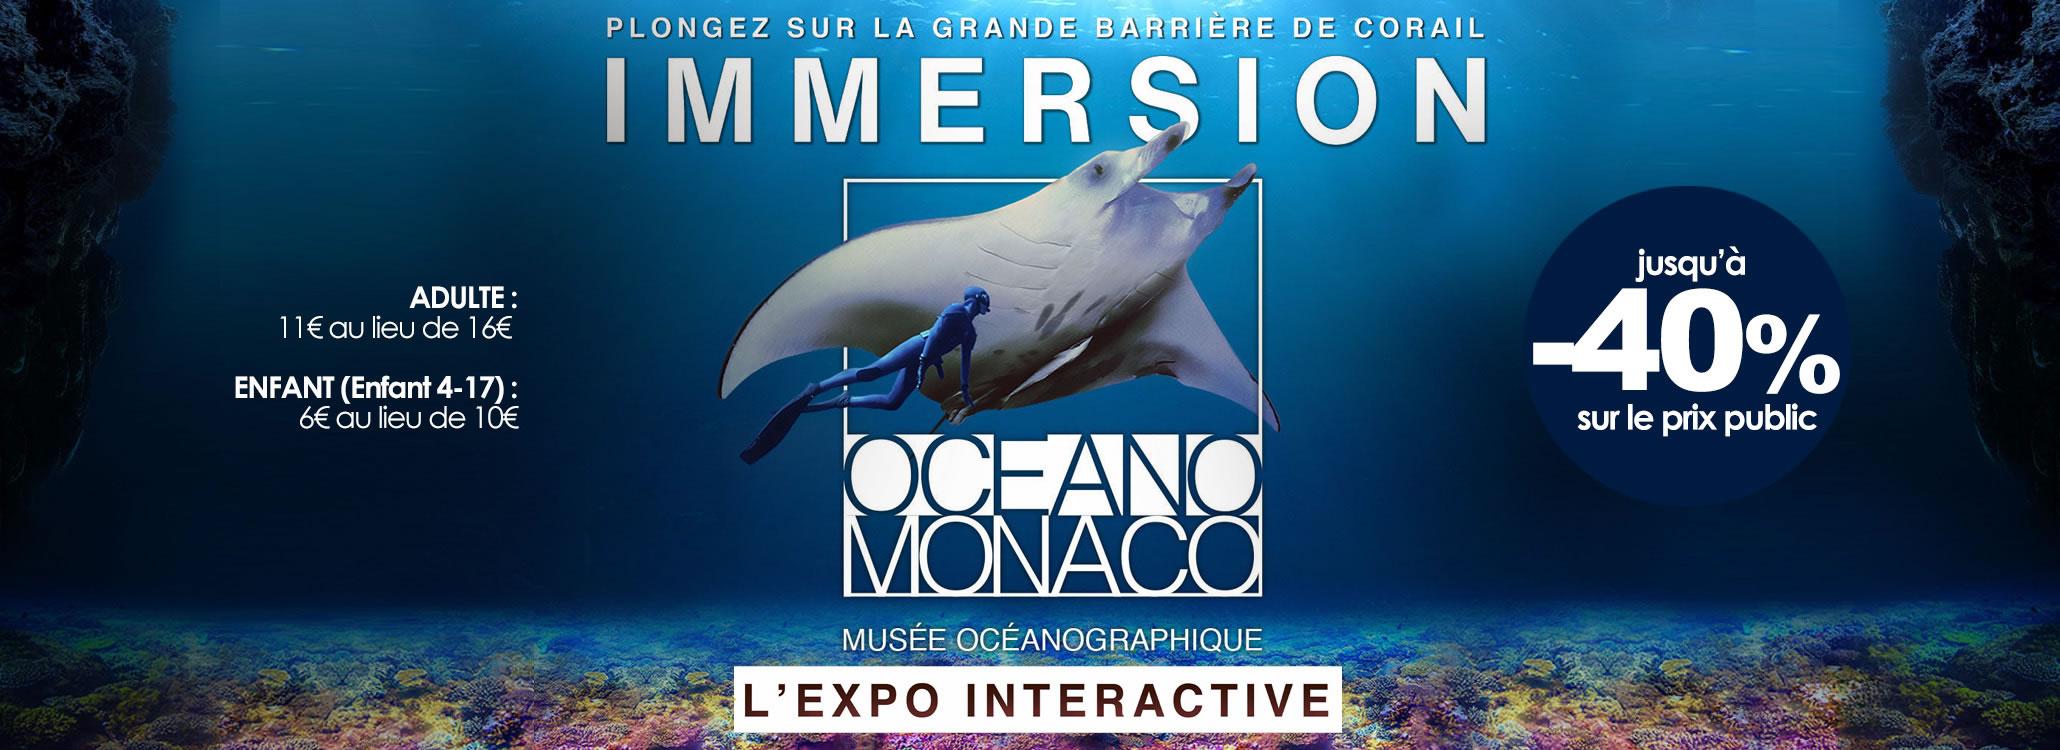 MUSEE-OCEANOGRAPHIQUE-MONACO-082020